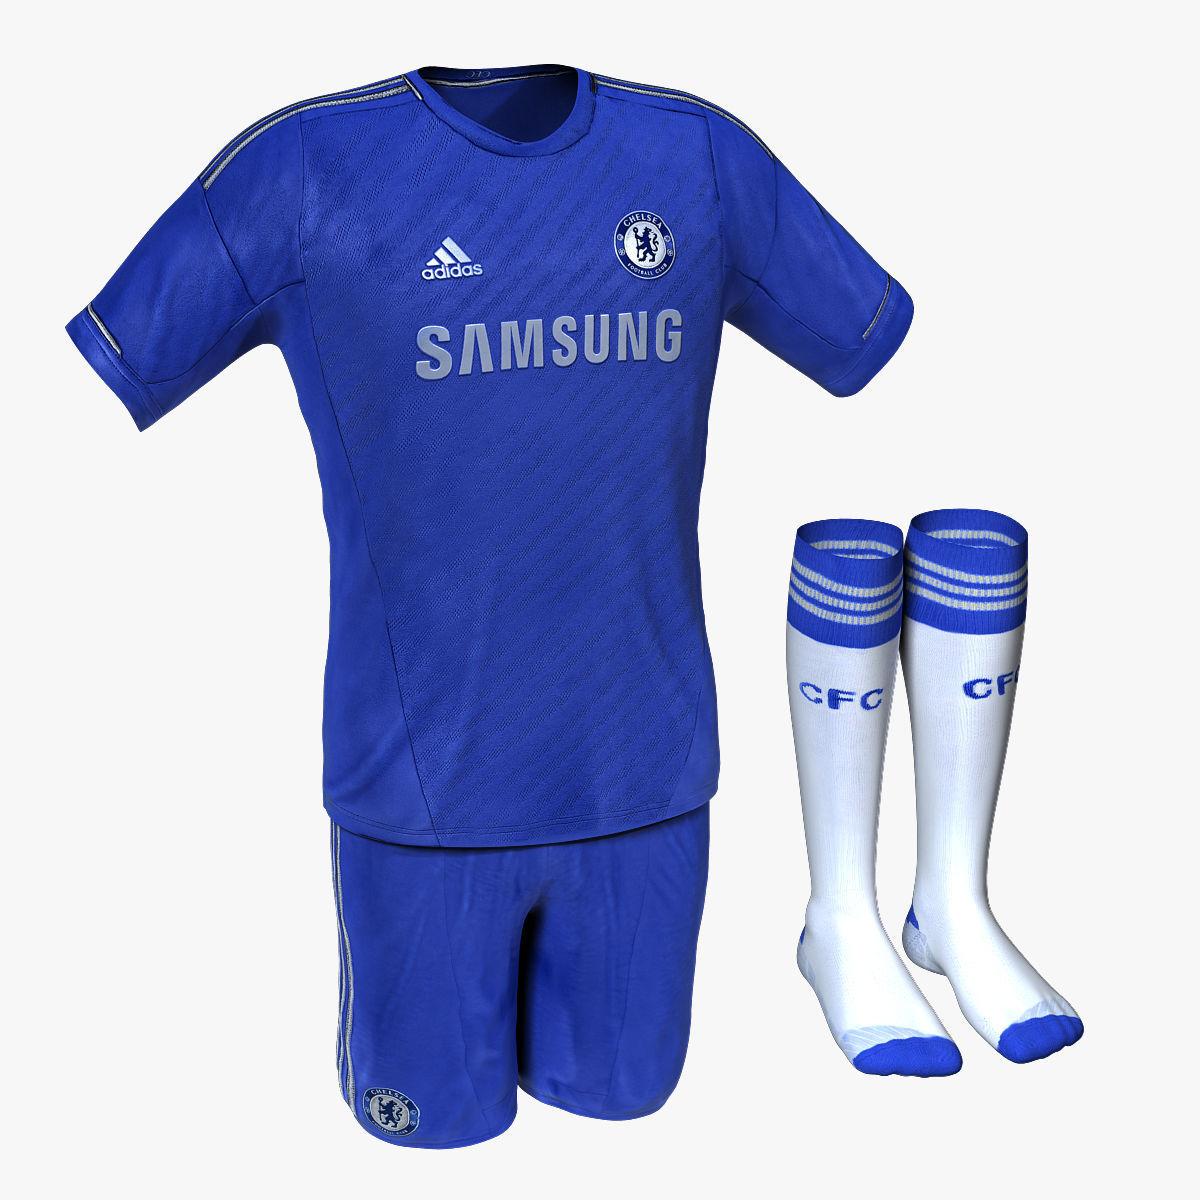 sale retailer e4eed 666a3 Chelsea FC Home Soccer Jersey | 3D model